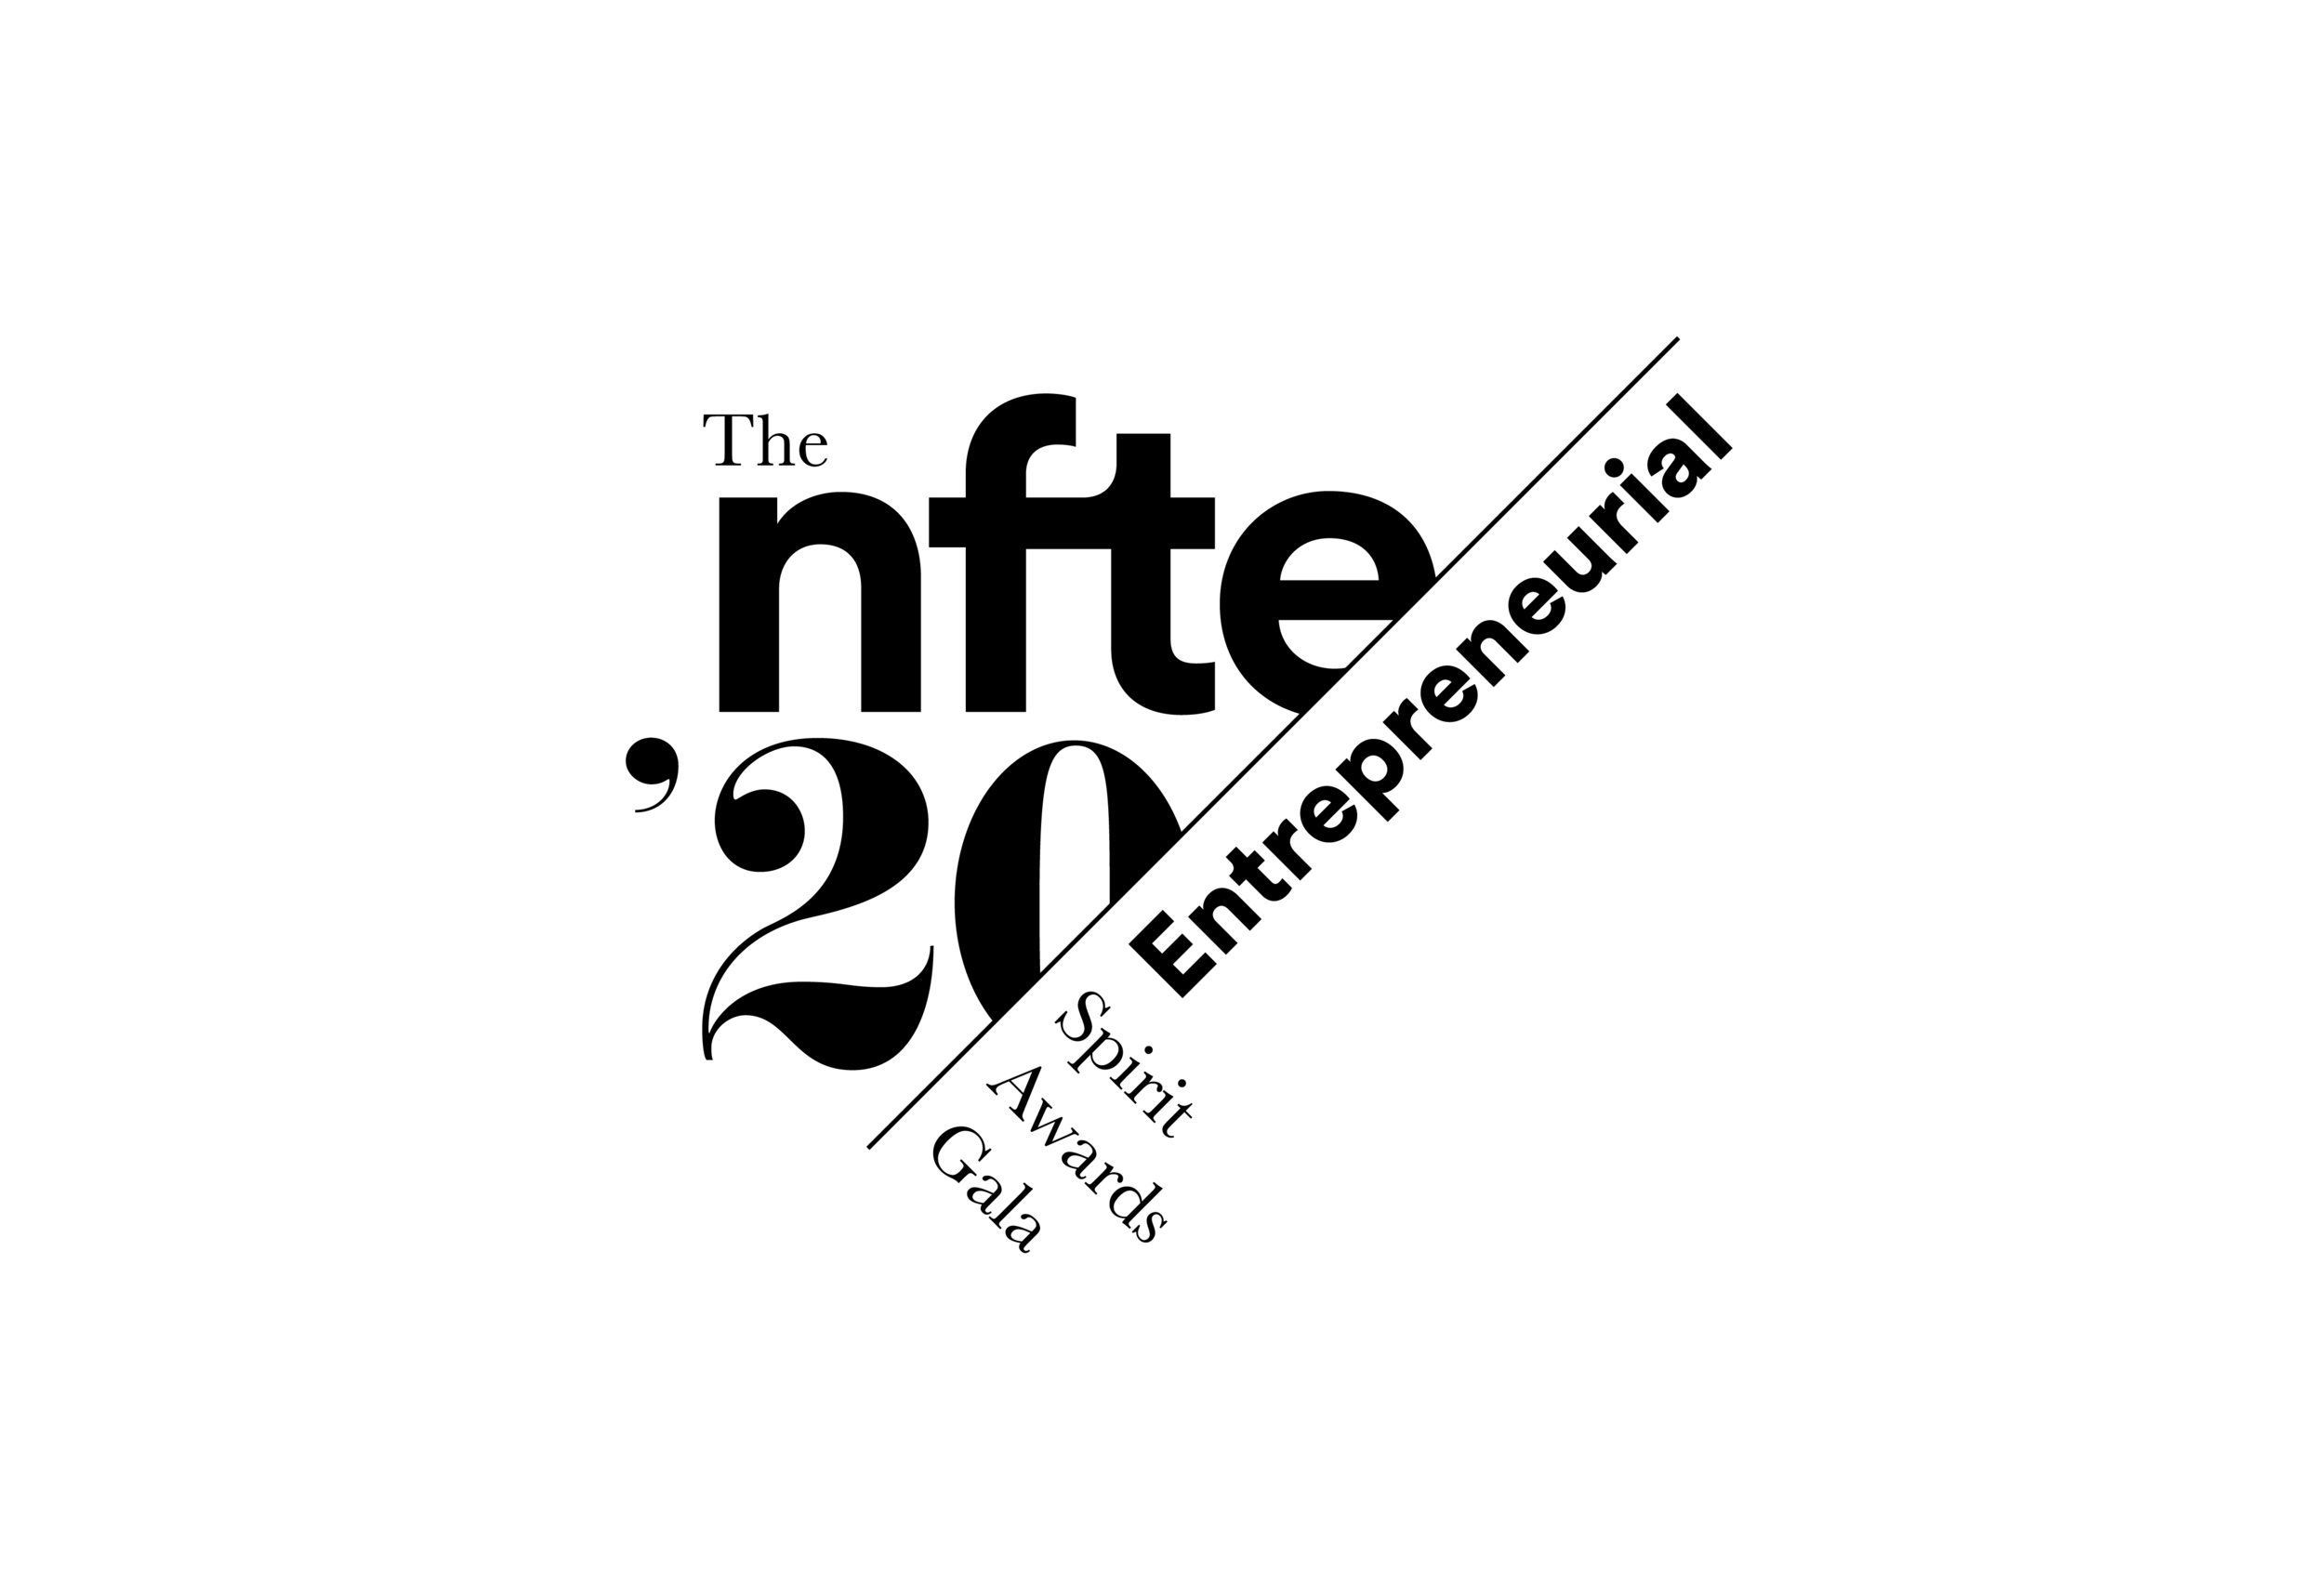 NFTE-Lockup-01.png